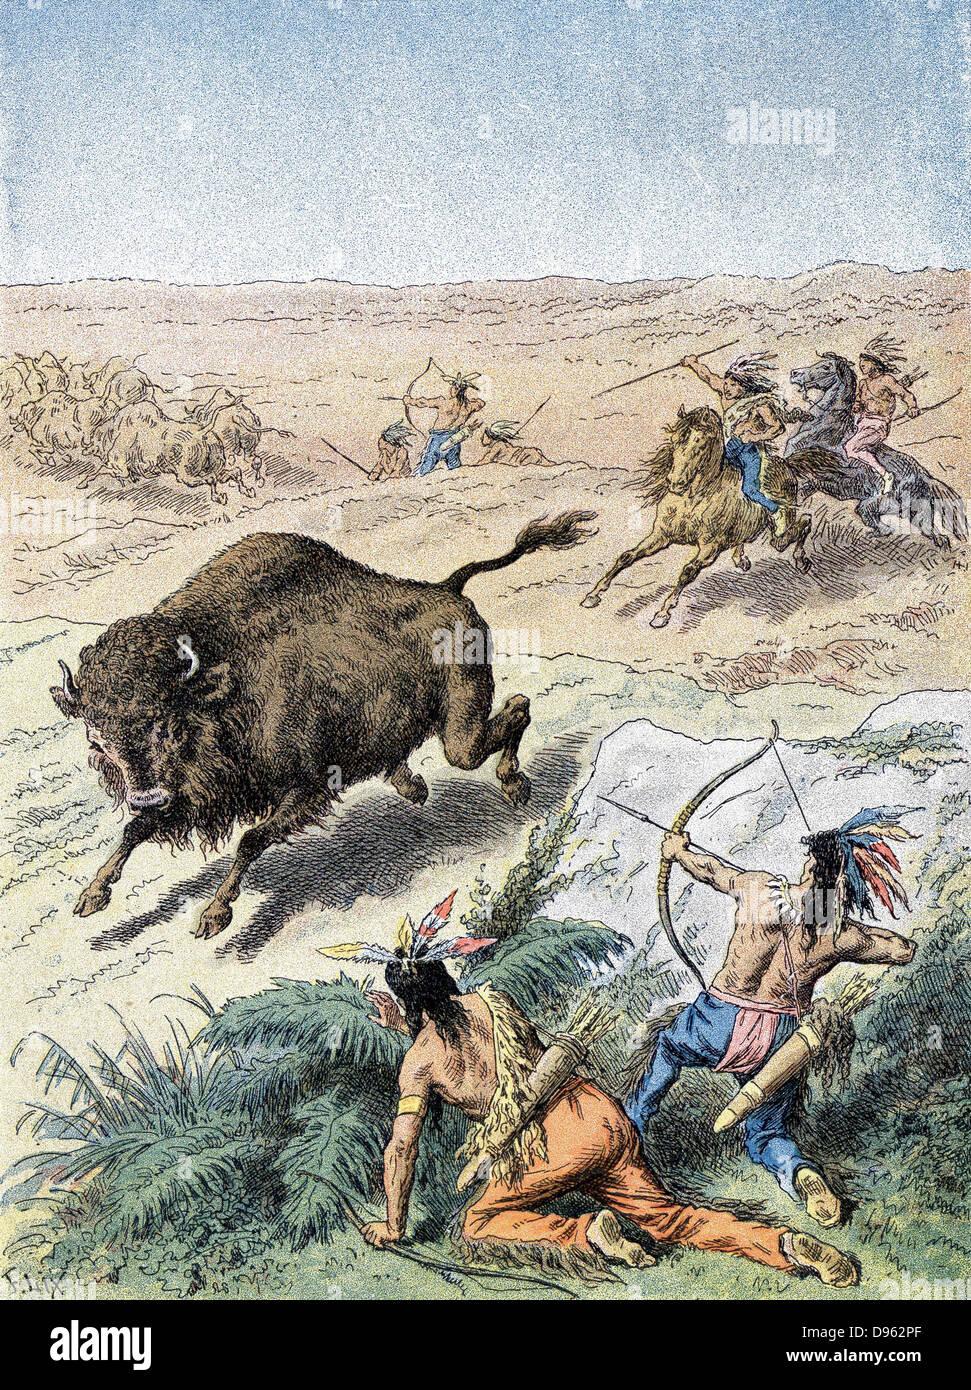 Native American  History Art Culture amp Facts  Native